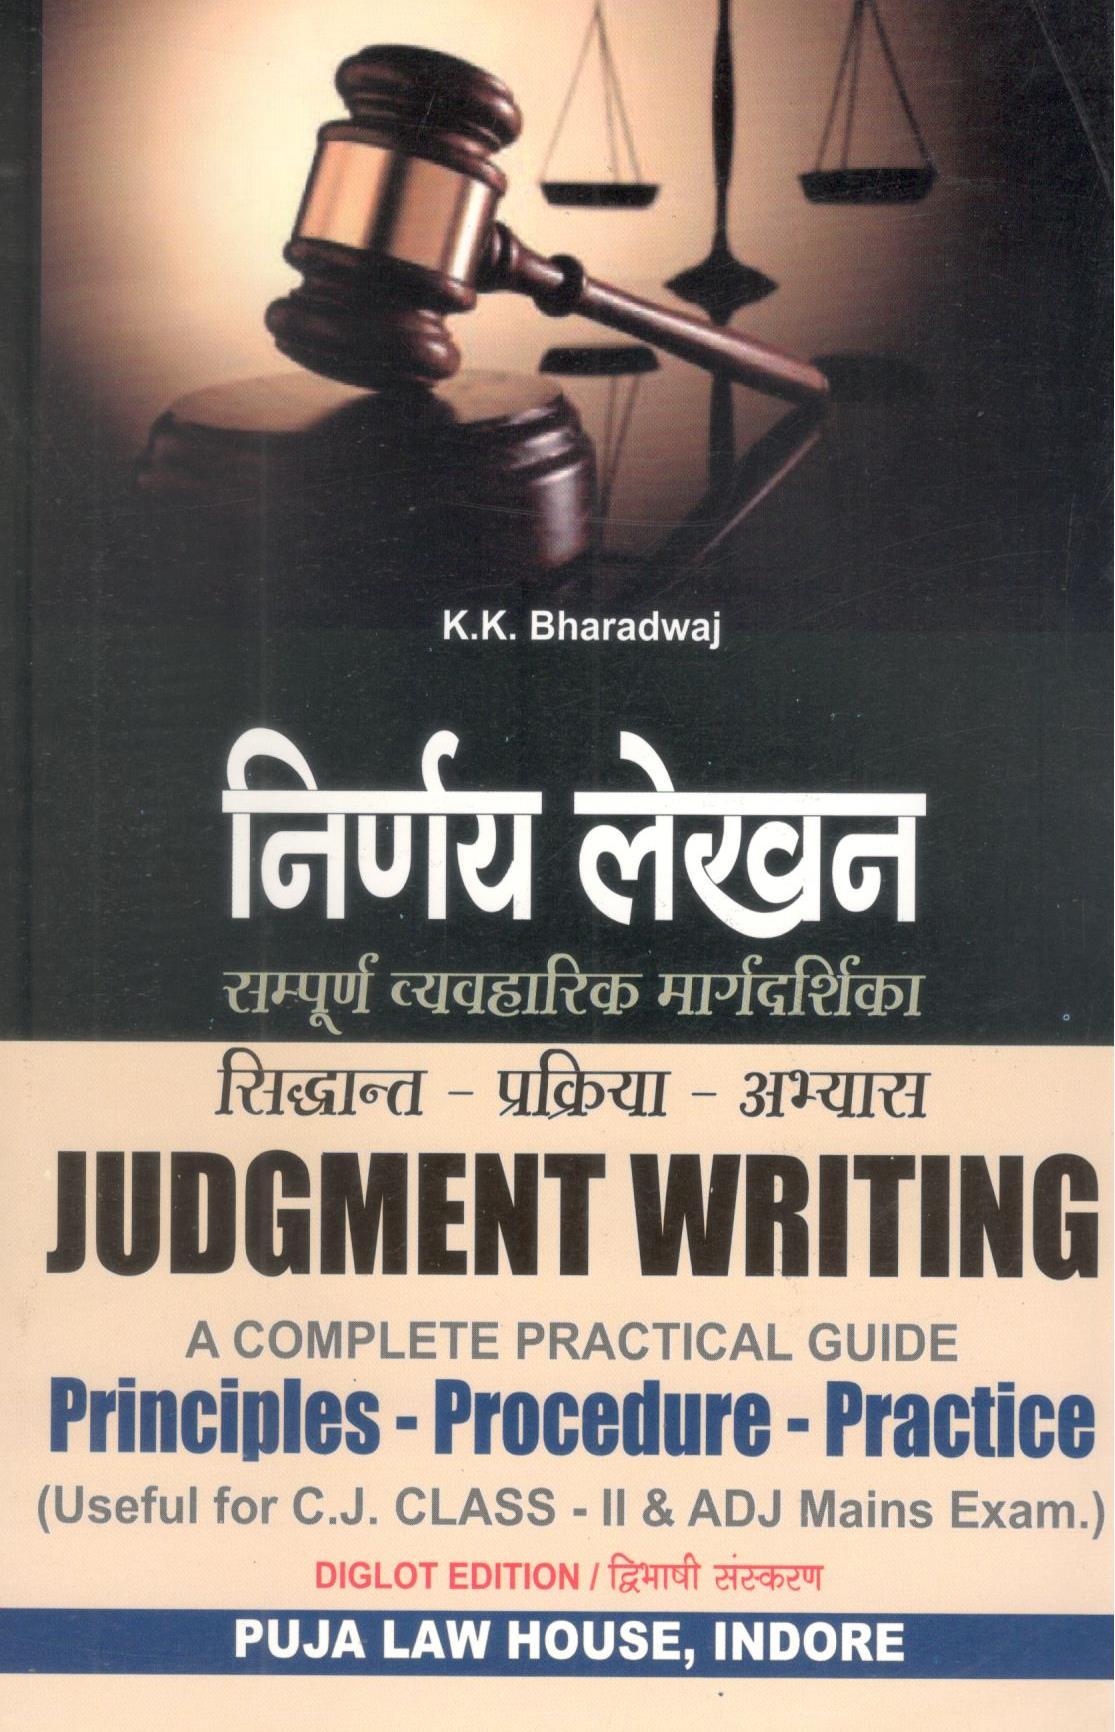 Judgment Writing - A Complete Practical Guide / निर�णय लेखन -संपूर�ण व�यवहारिक मार�गदर�शिका : सिद�धांत - प�रक�रिया - अभ�यास